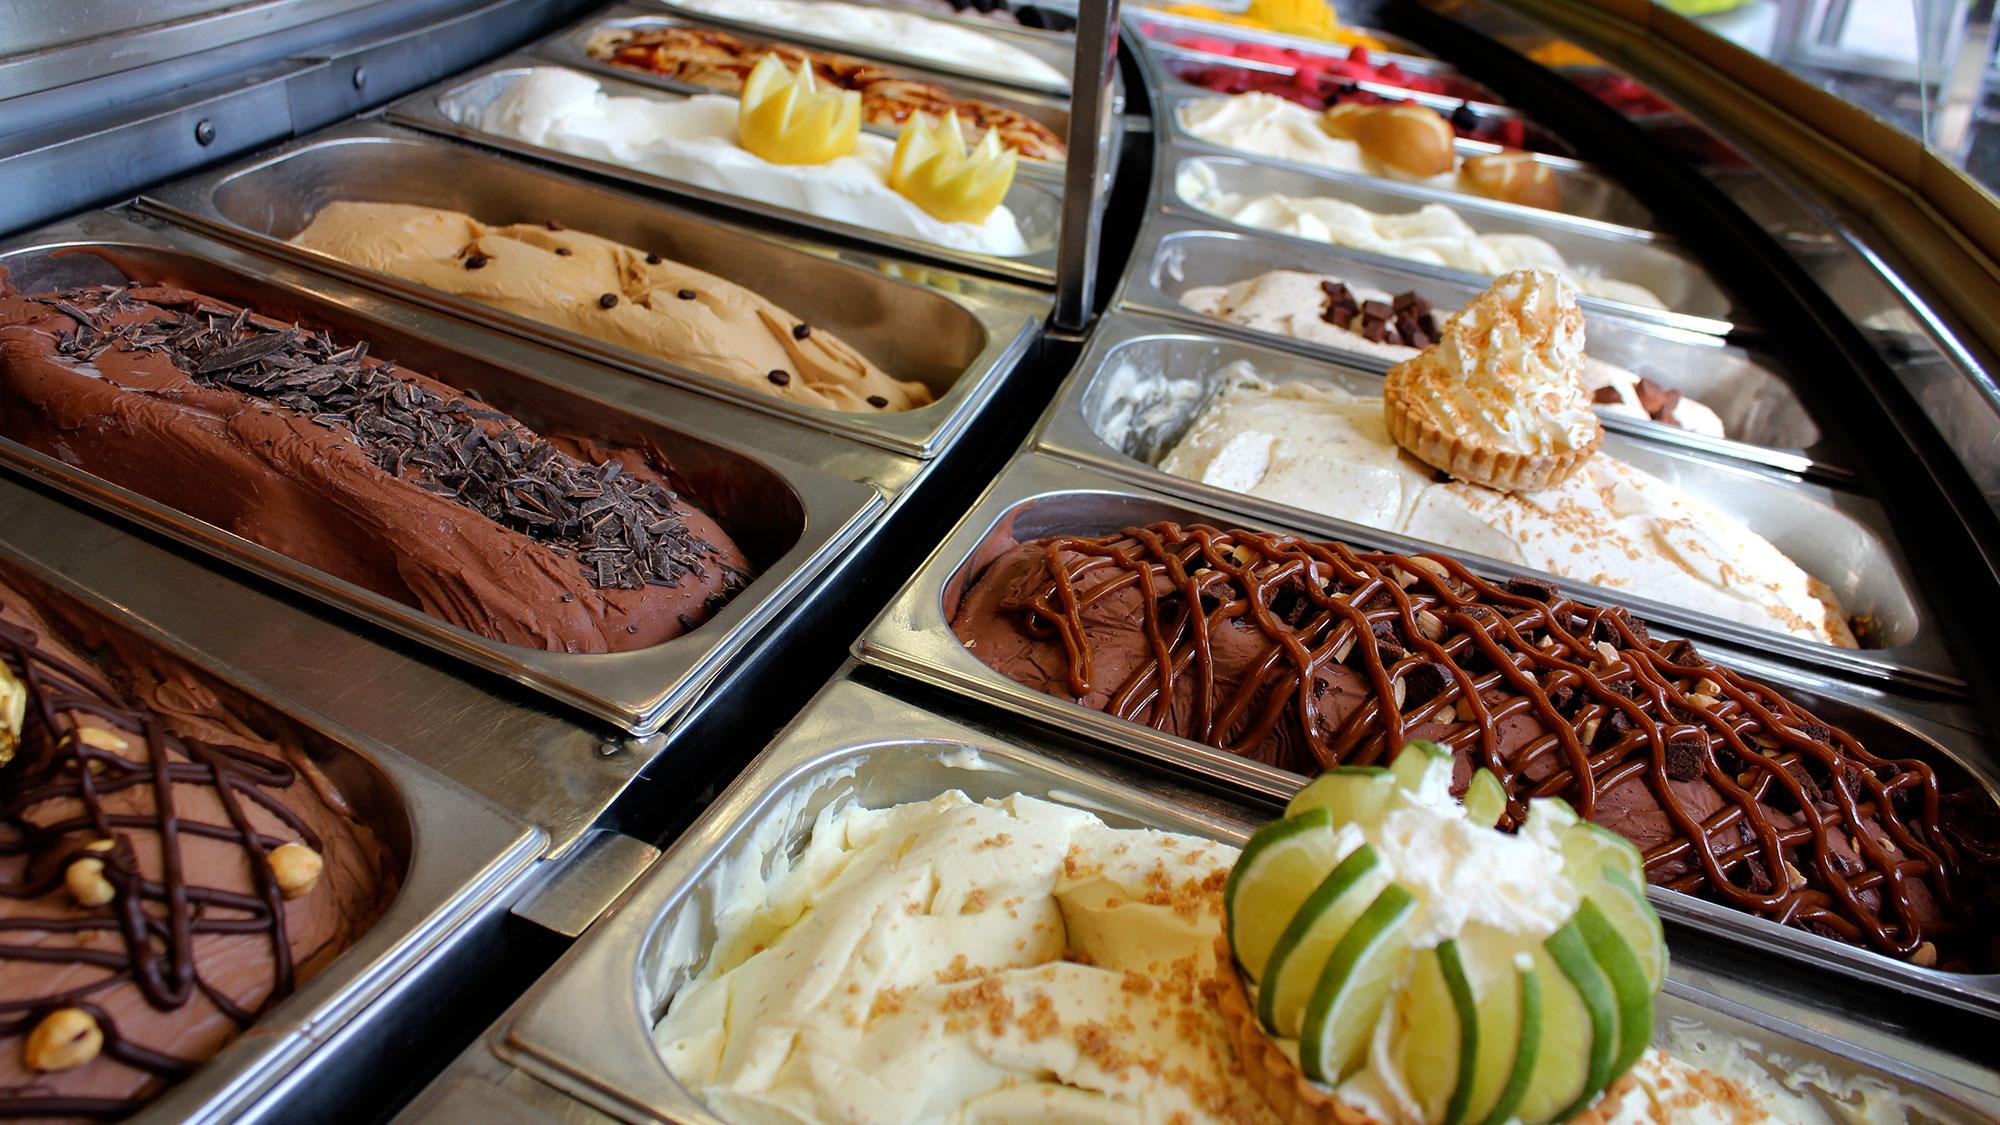 Hollywood_Gelato-gelato-case2